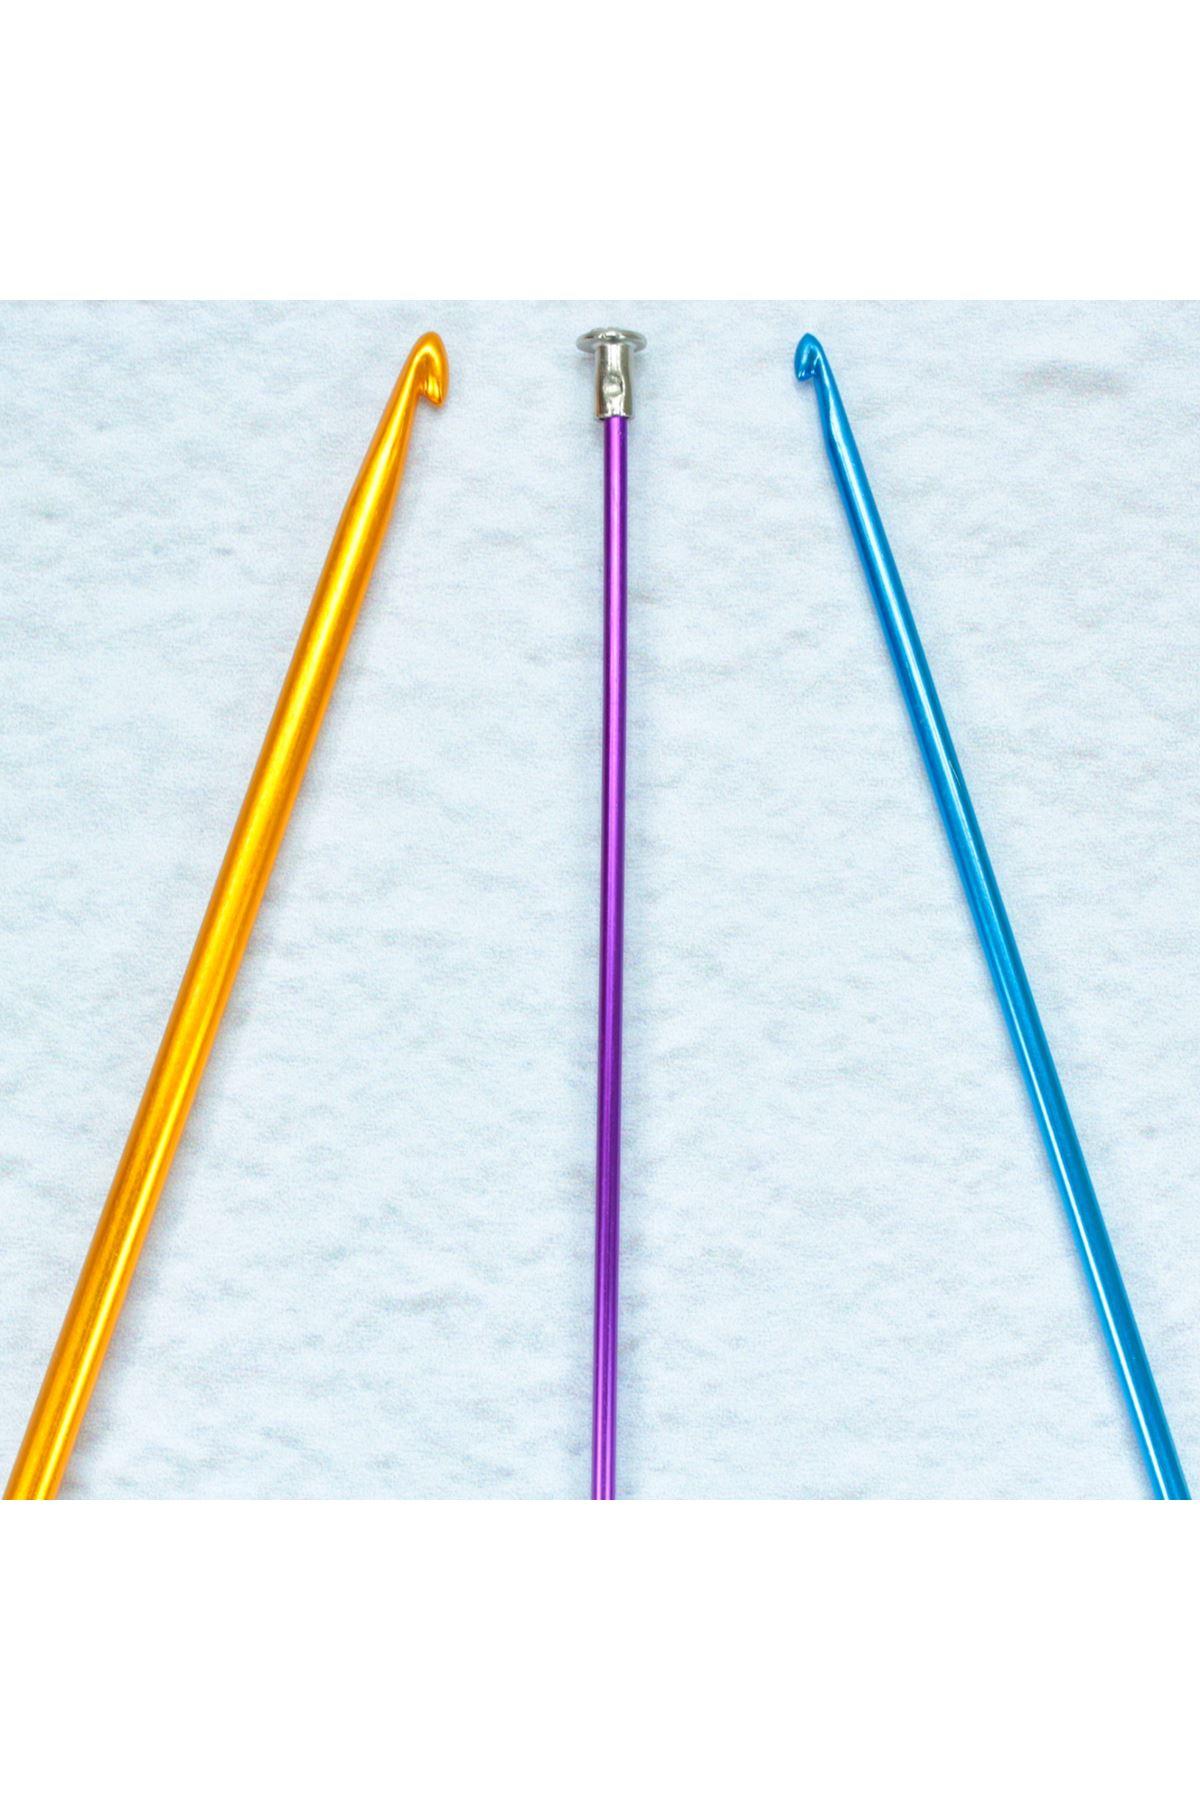 Renkli Metal Gagalı Şiş 35 cm